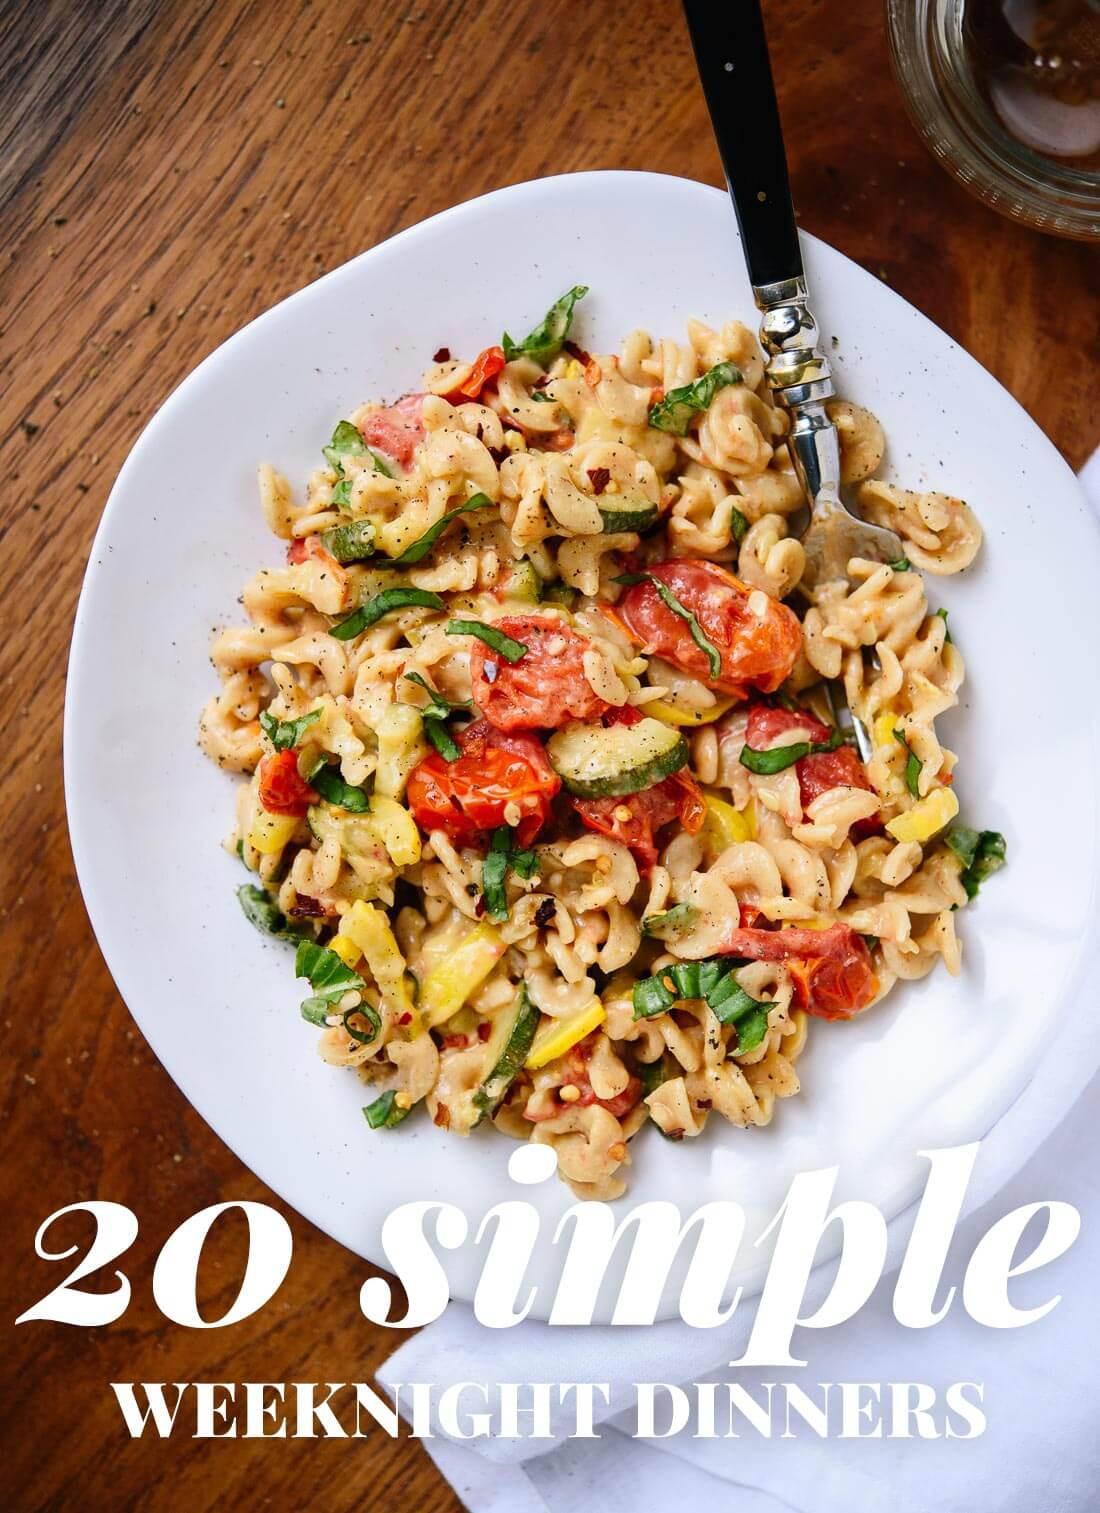 Healthy Vegetarian Dinner  20 Simple Ve arian Dinner Recipes Cookie and Kate